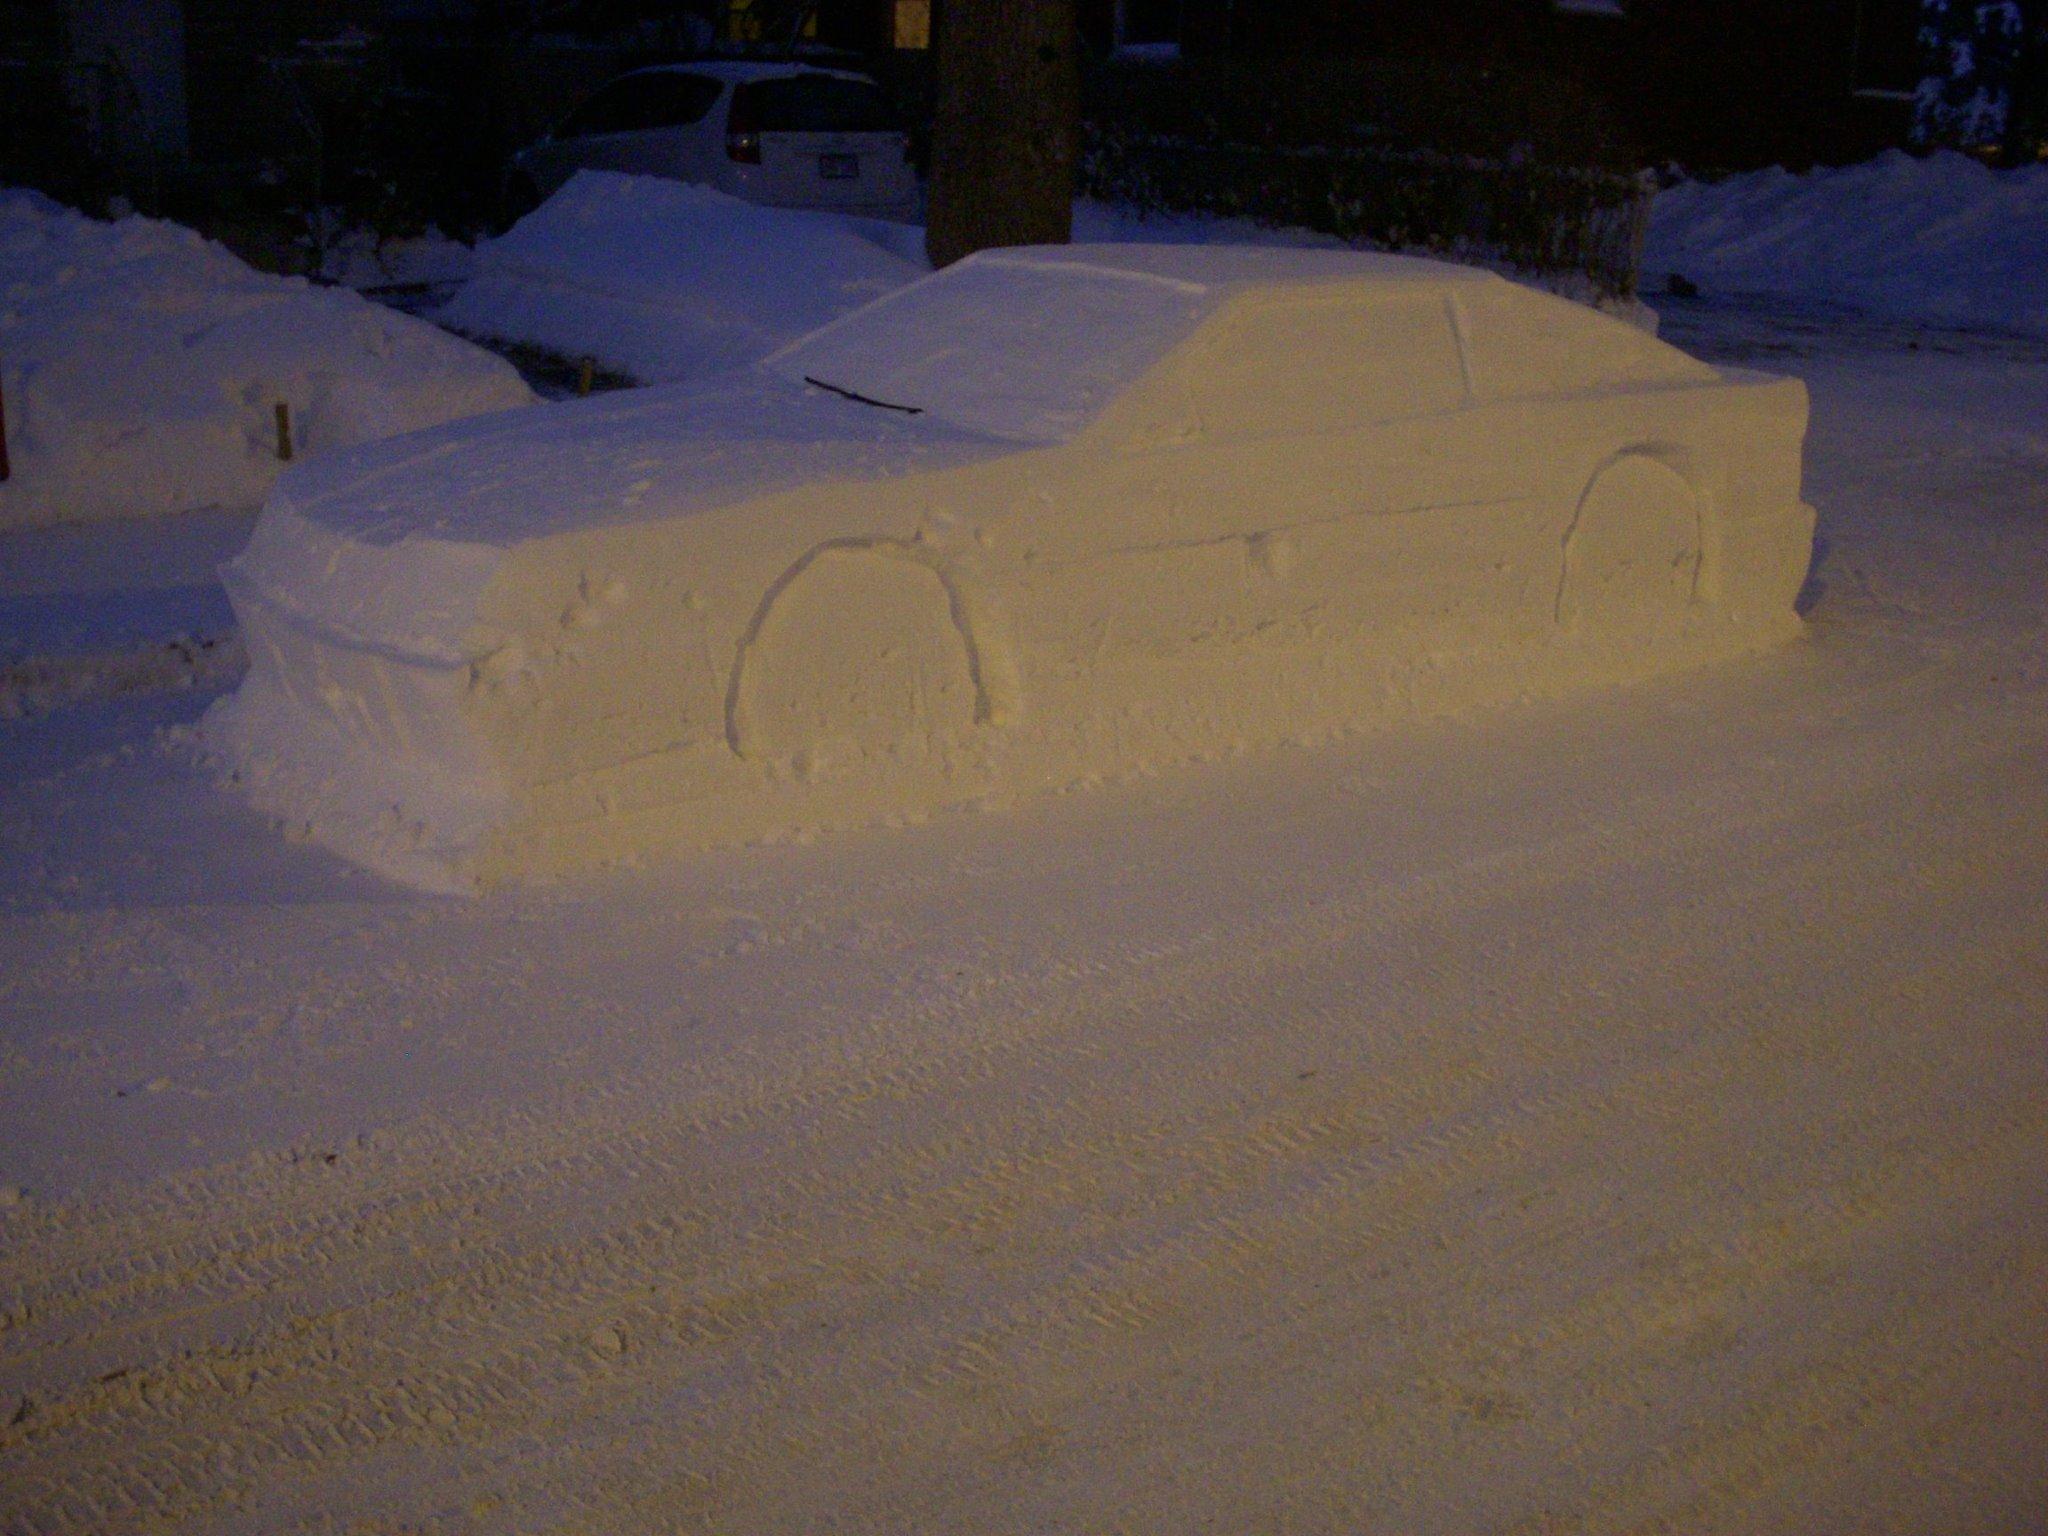 Toyota Supra snow (13)